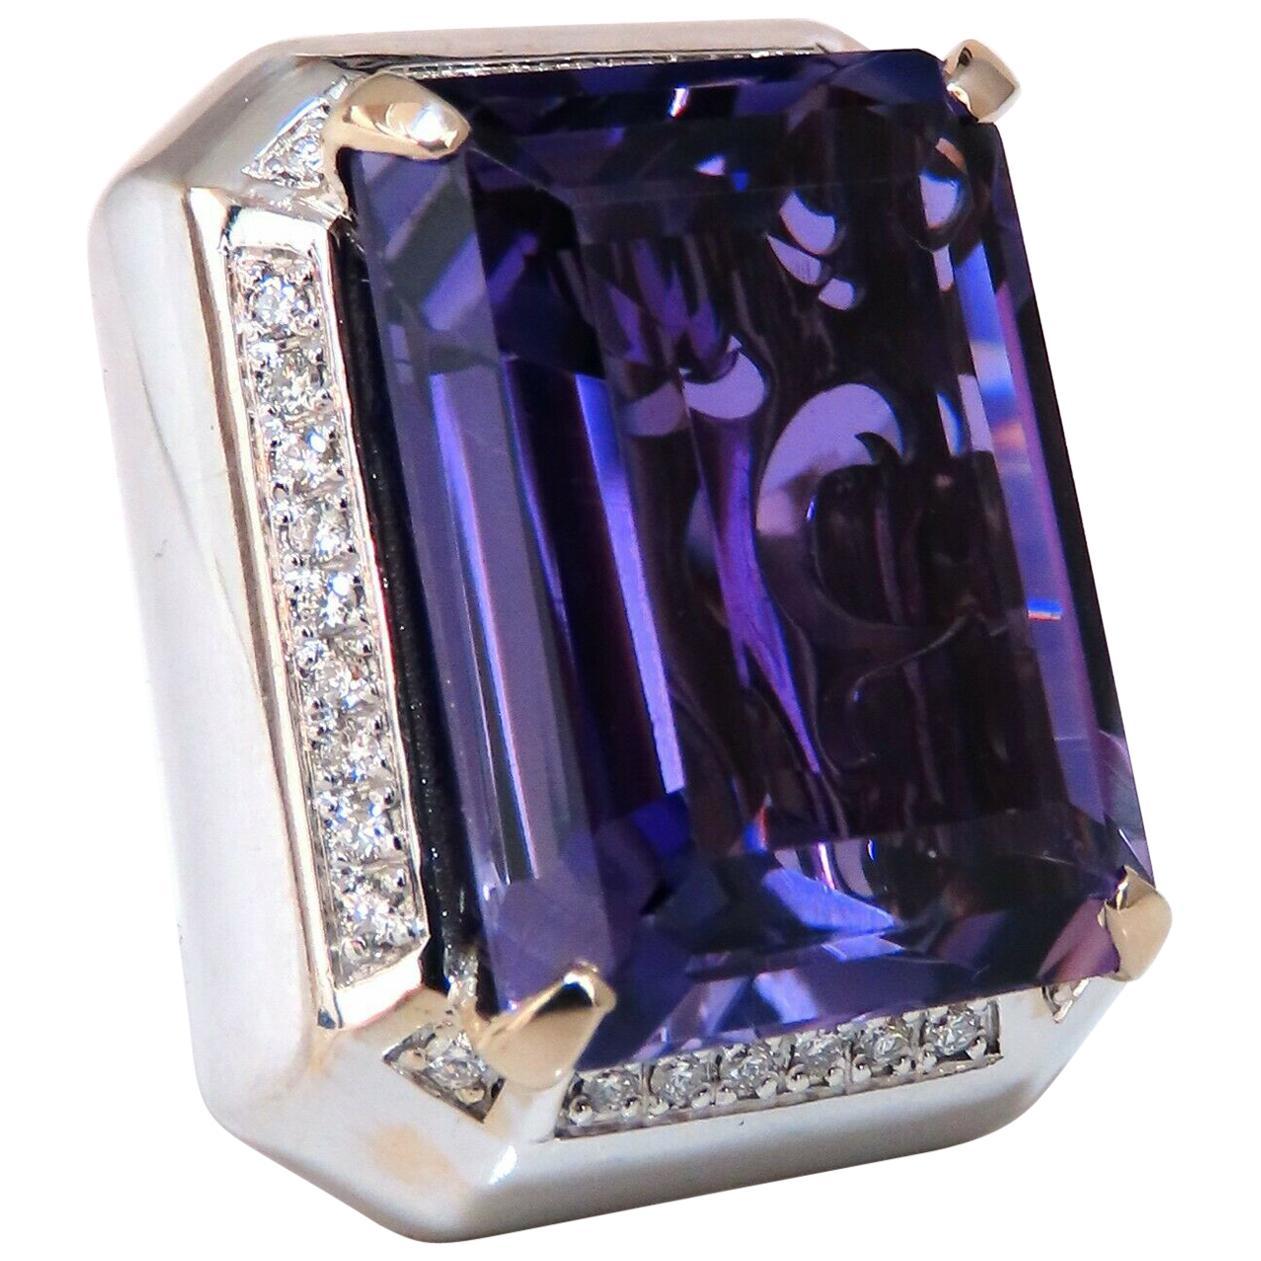 37.23 Carat Natural Amethyst Diamond Ring 18 Karat Cocktail Cluster